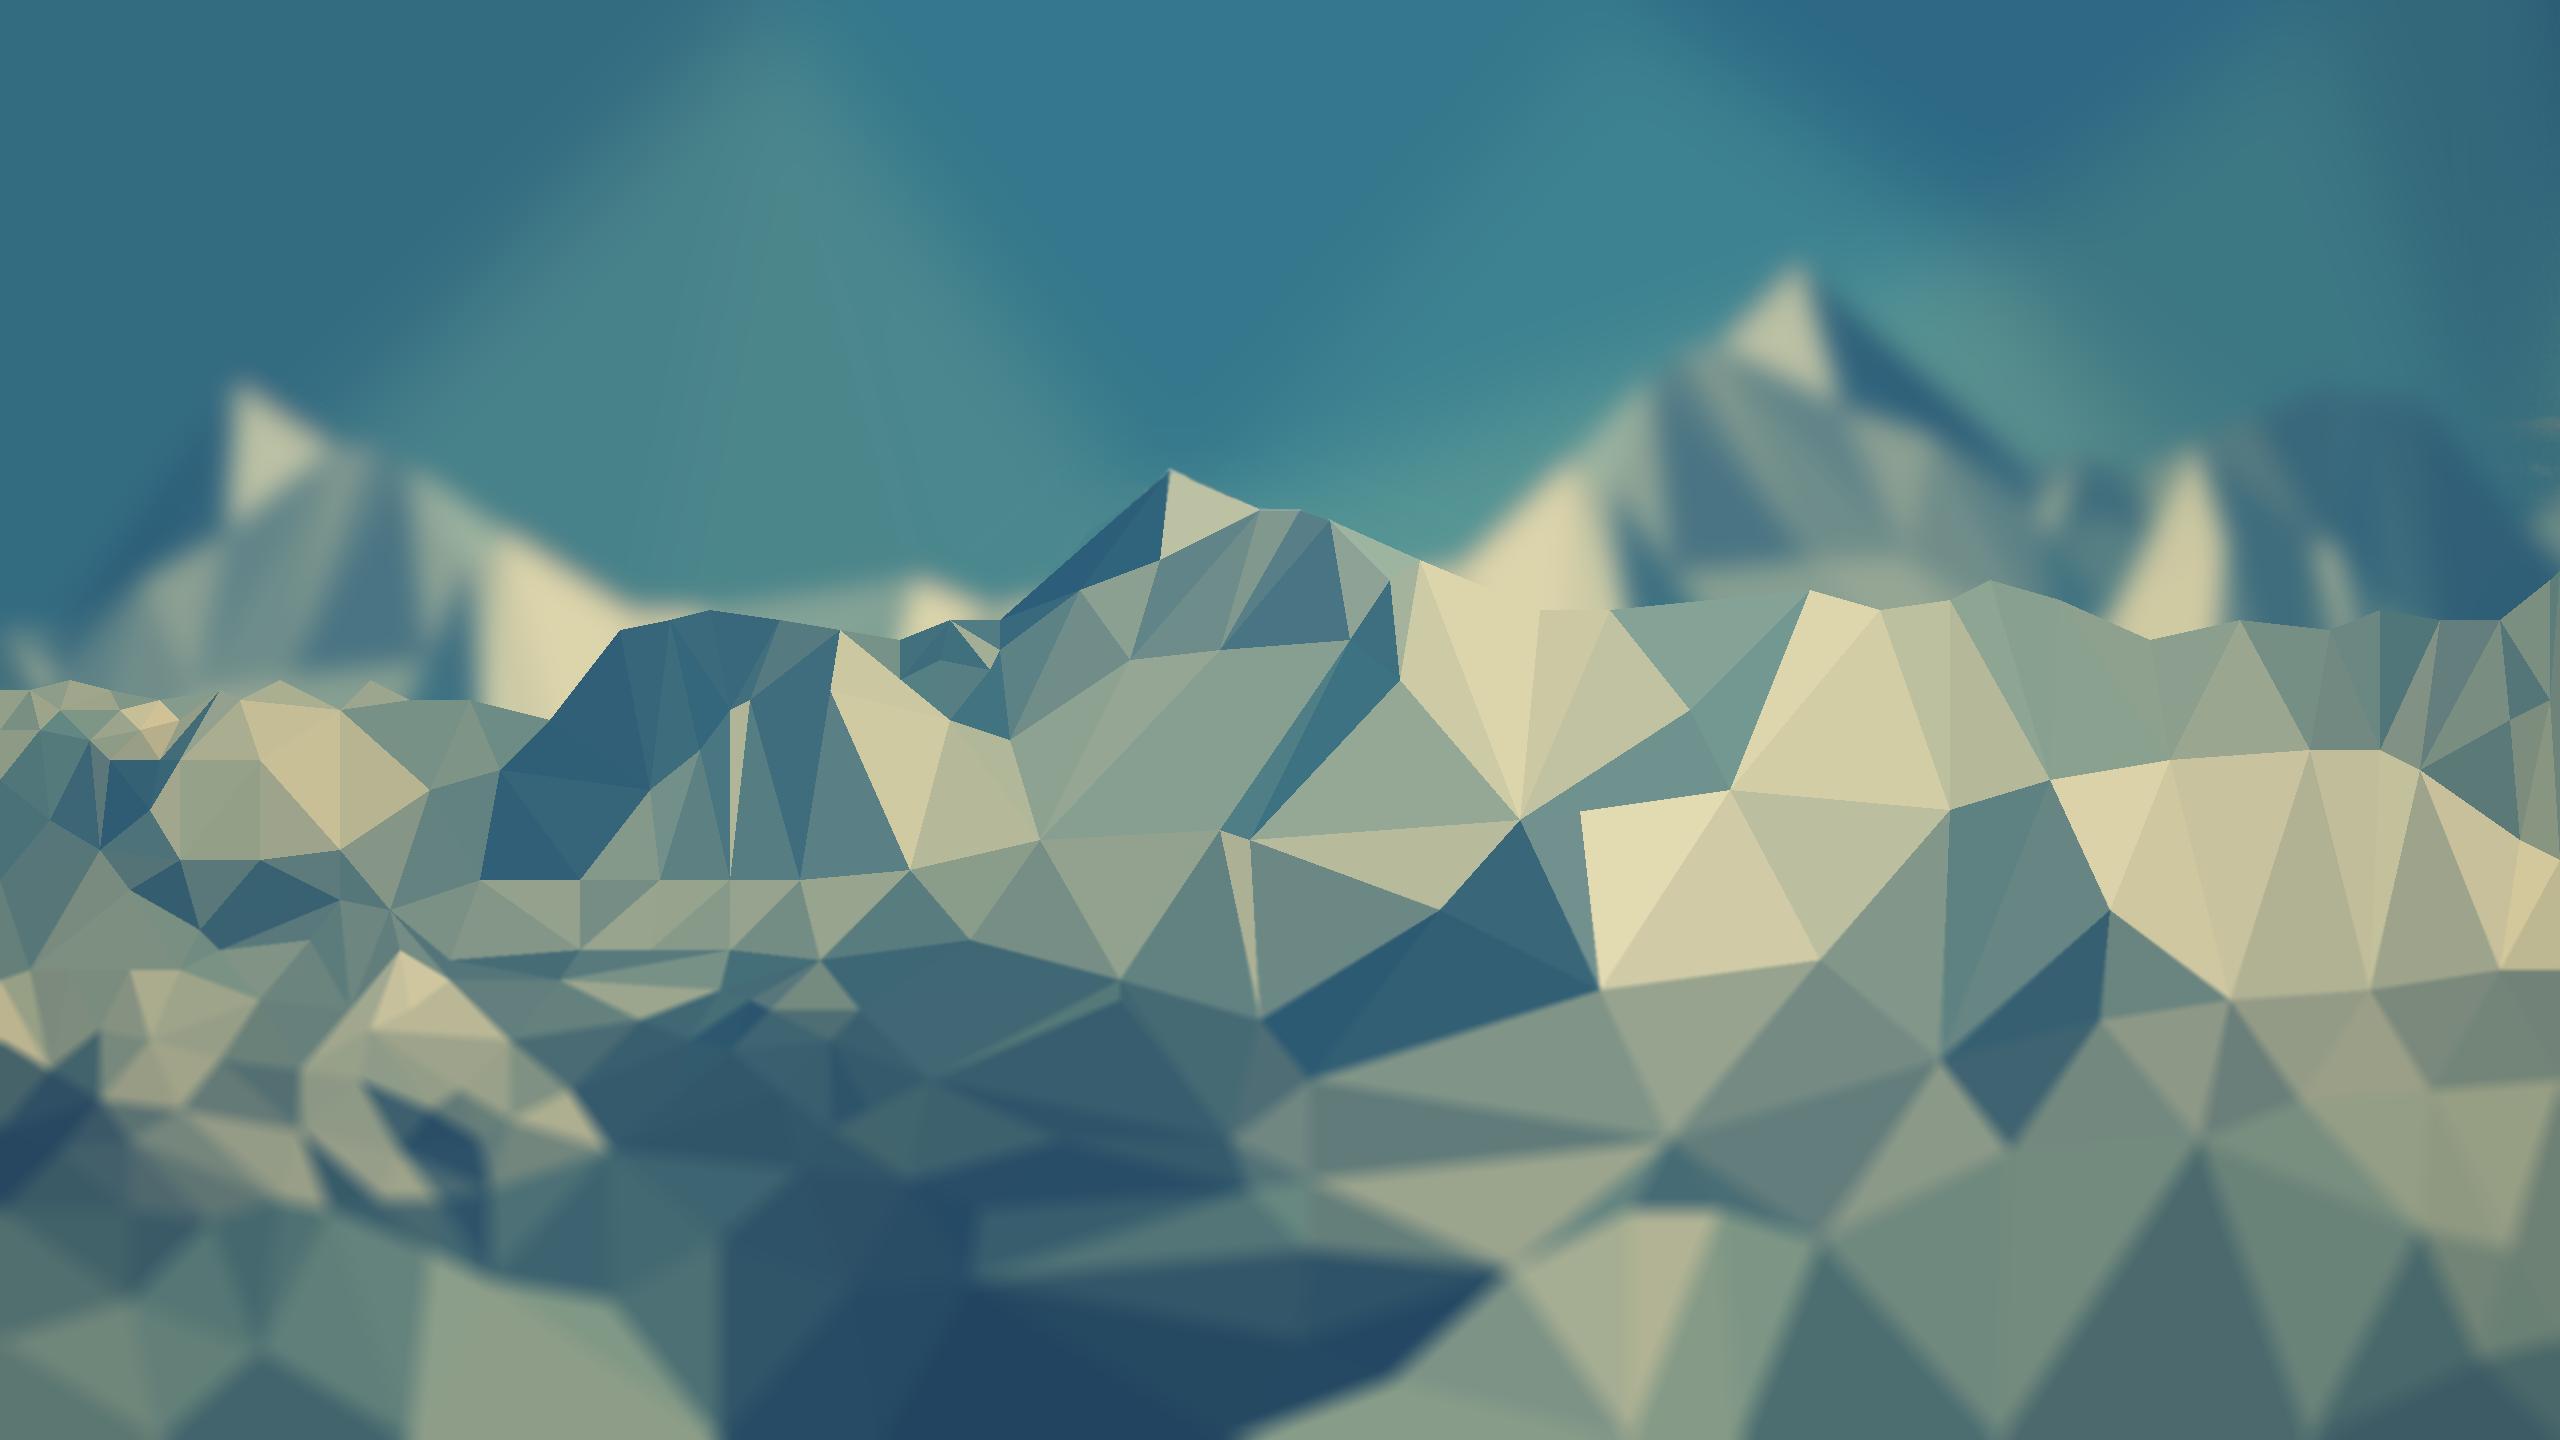 Great Wallpaper Mountain Pattern - 73877e88f84174cb12e9bc0eae84825d  HD_29330.png